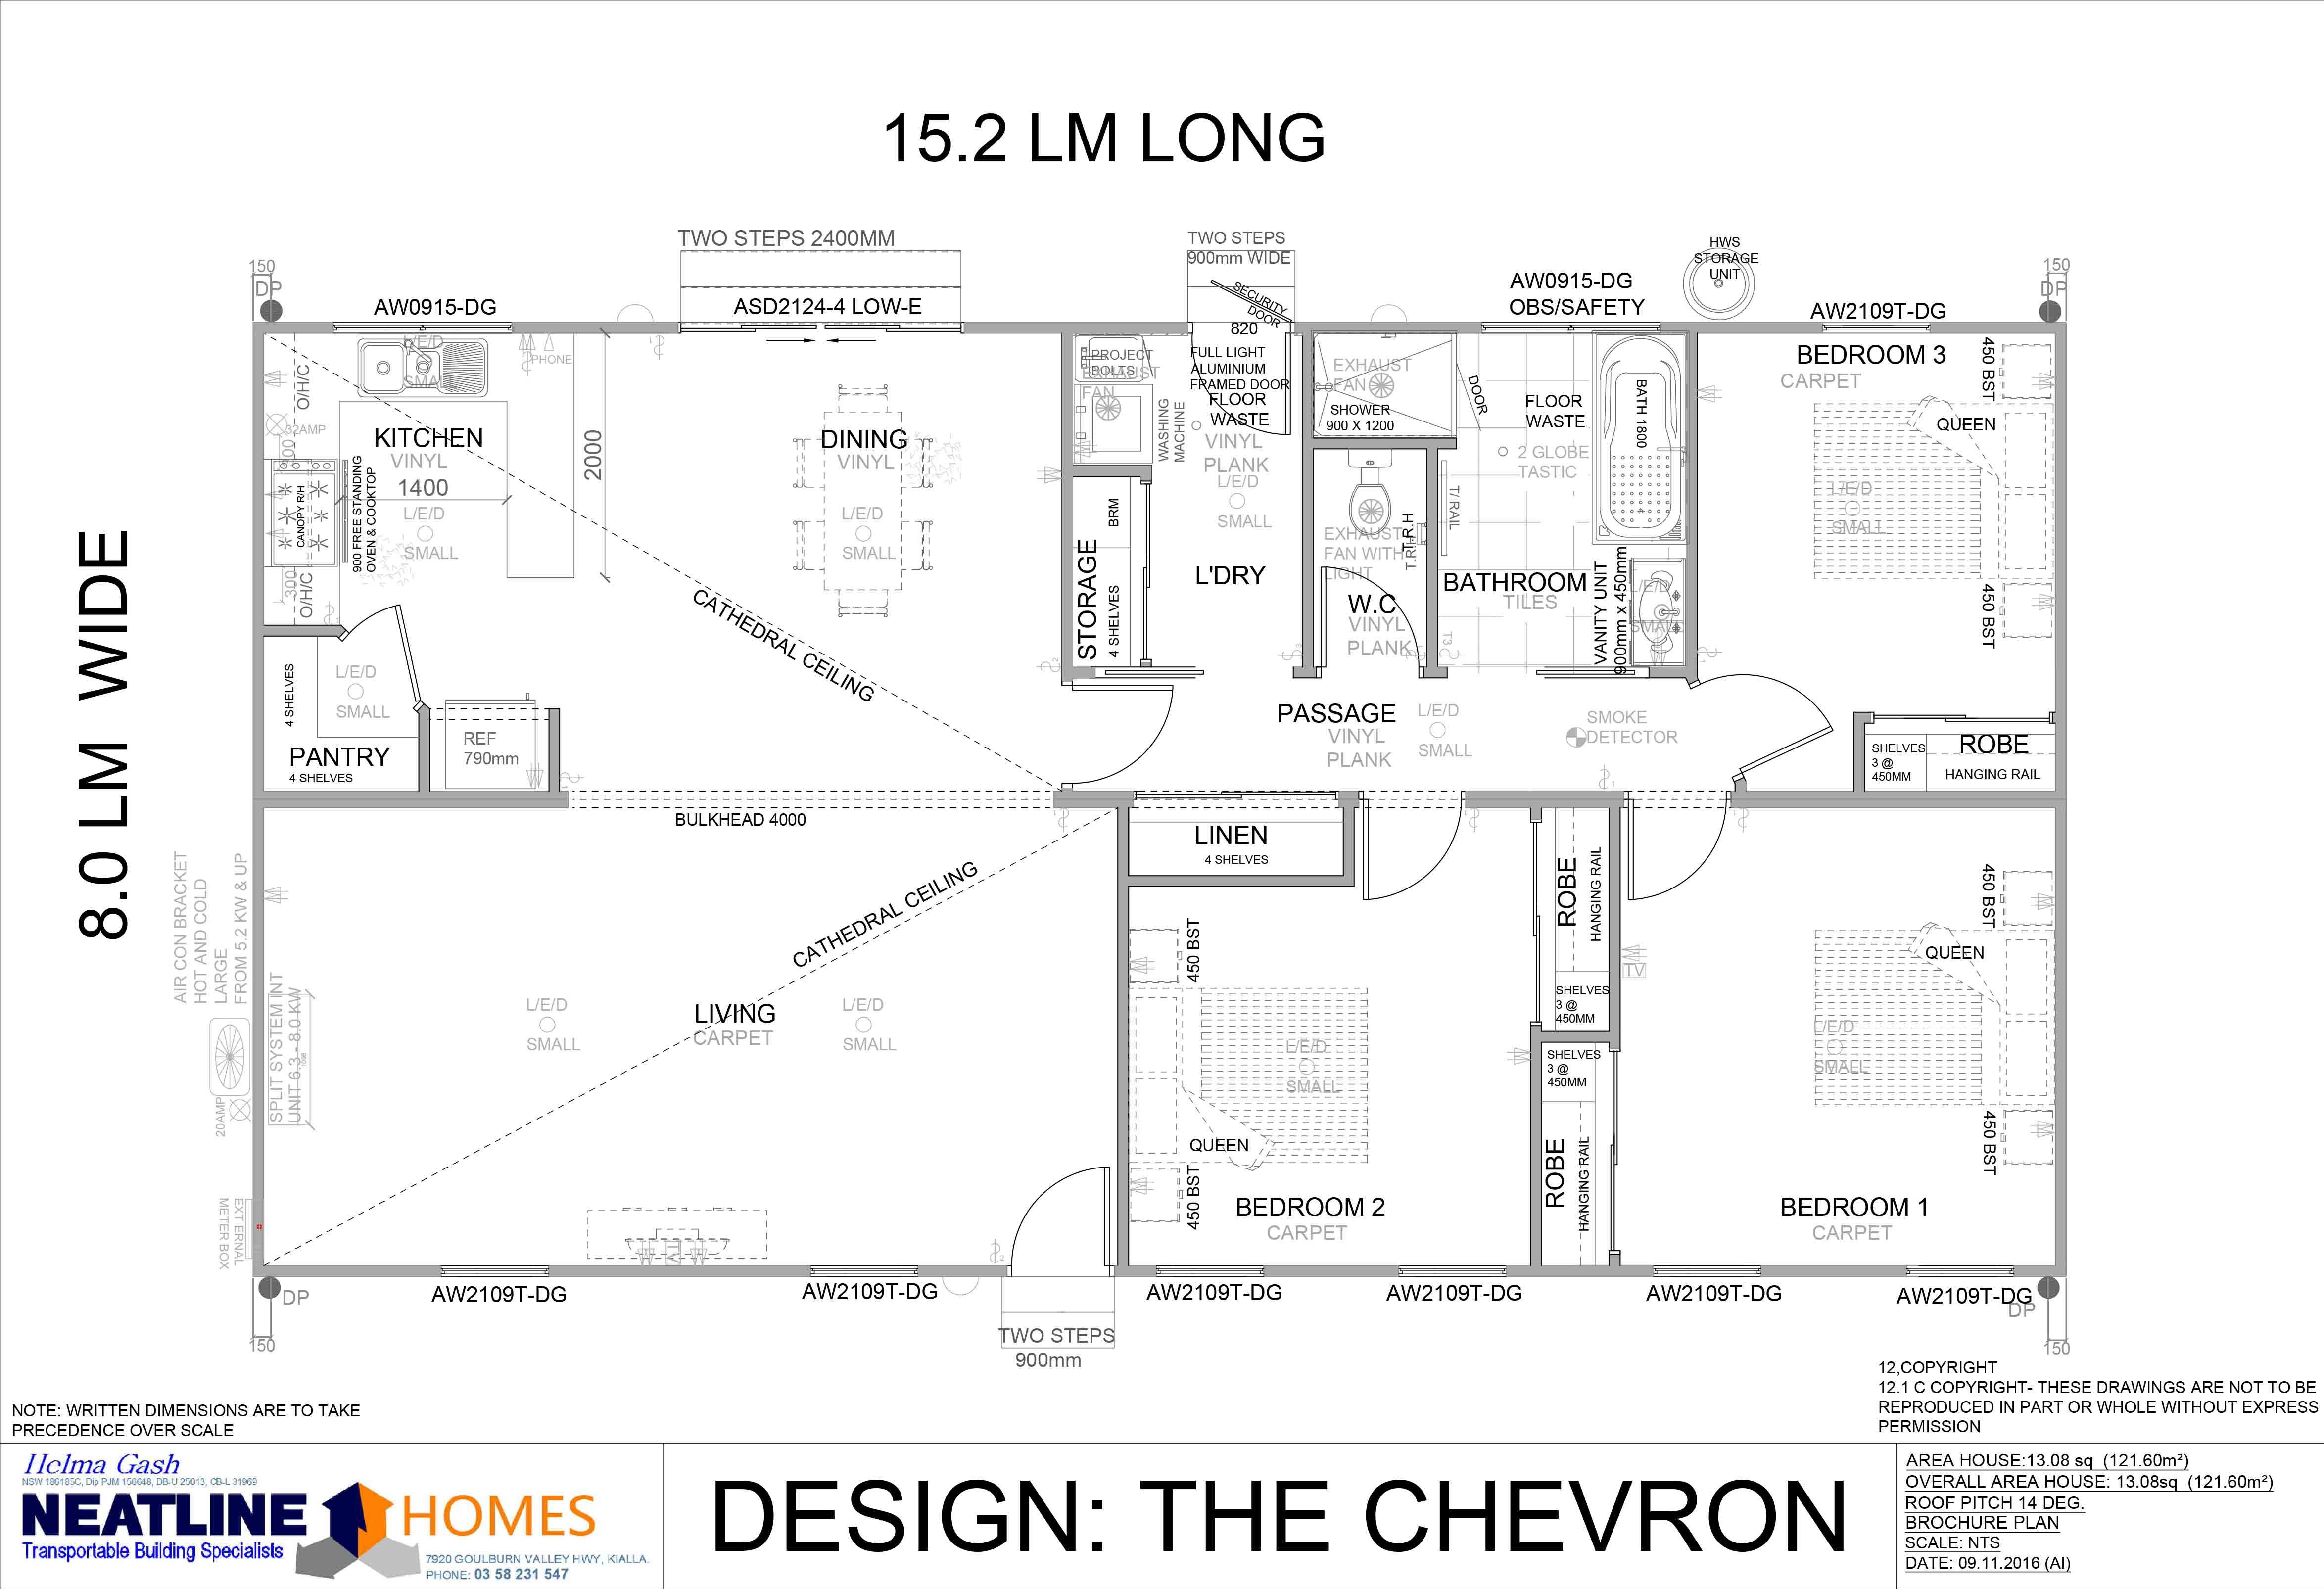 the chevron floorplan